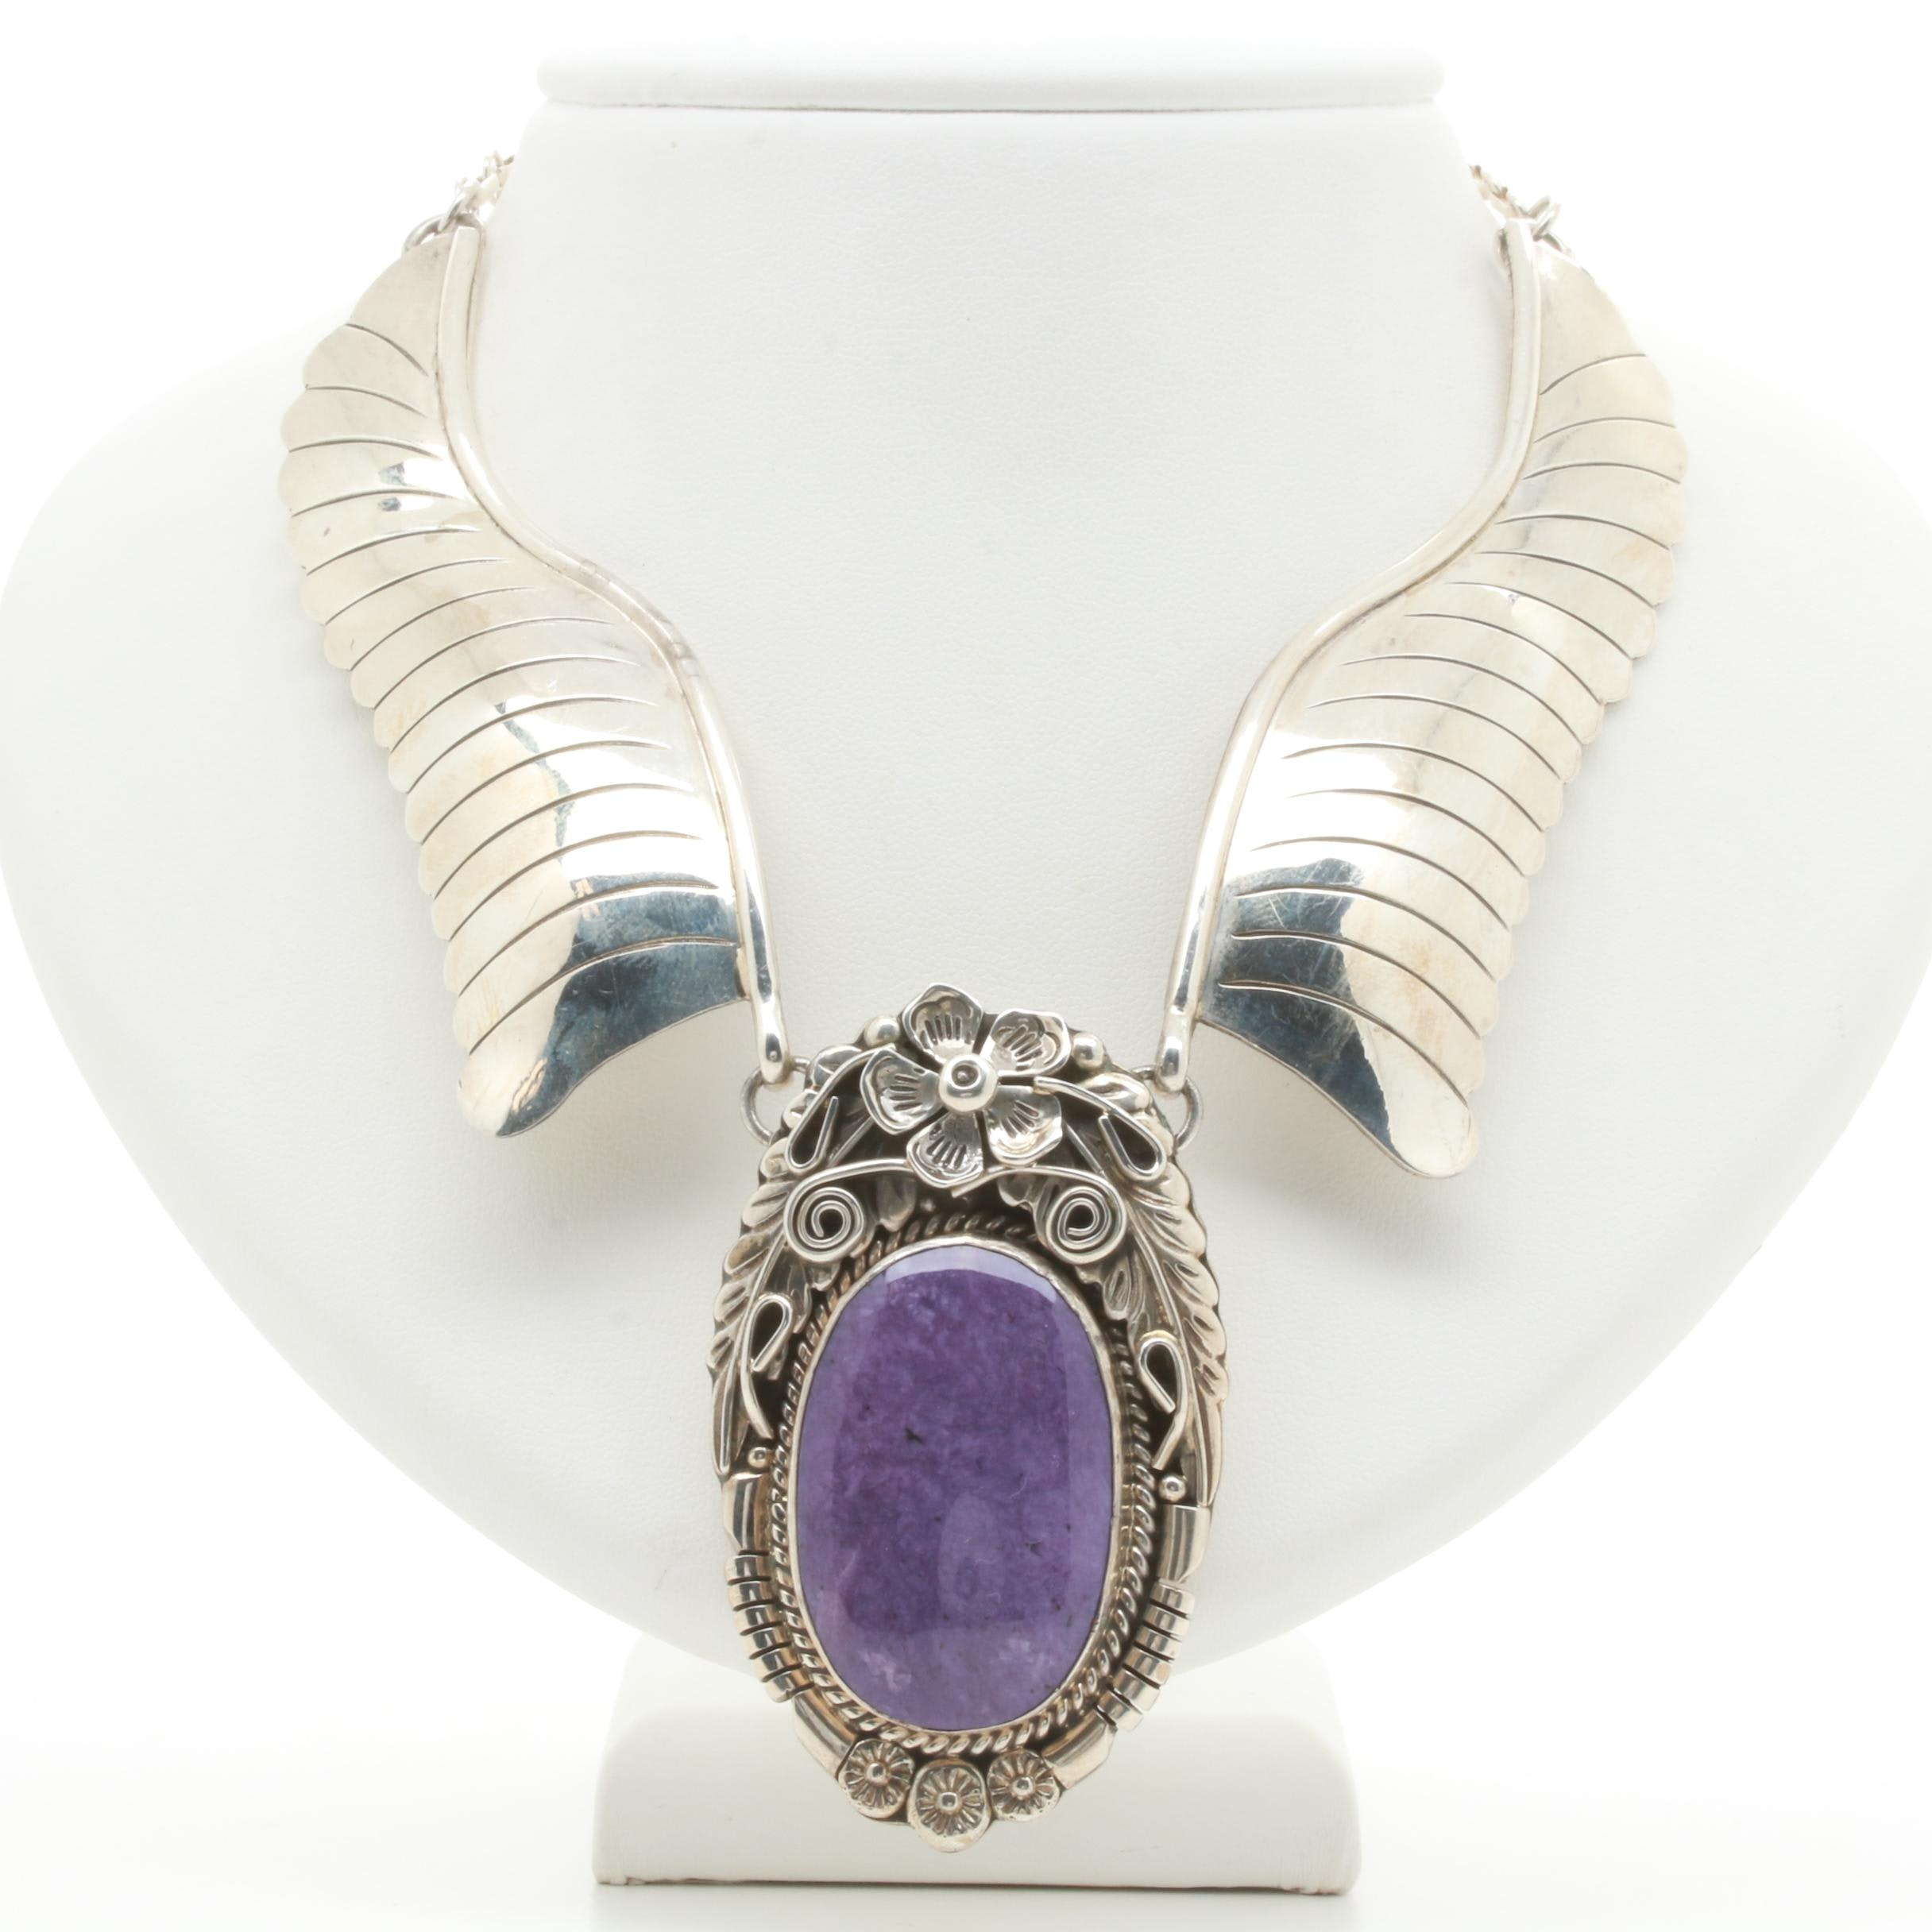 Handmade C. Whiterock Sterling Silver Southwestern Style Sugilite Necklace